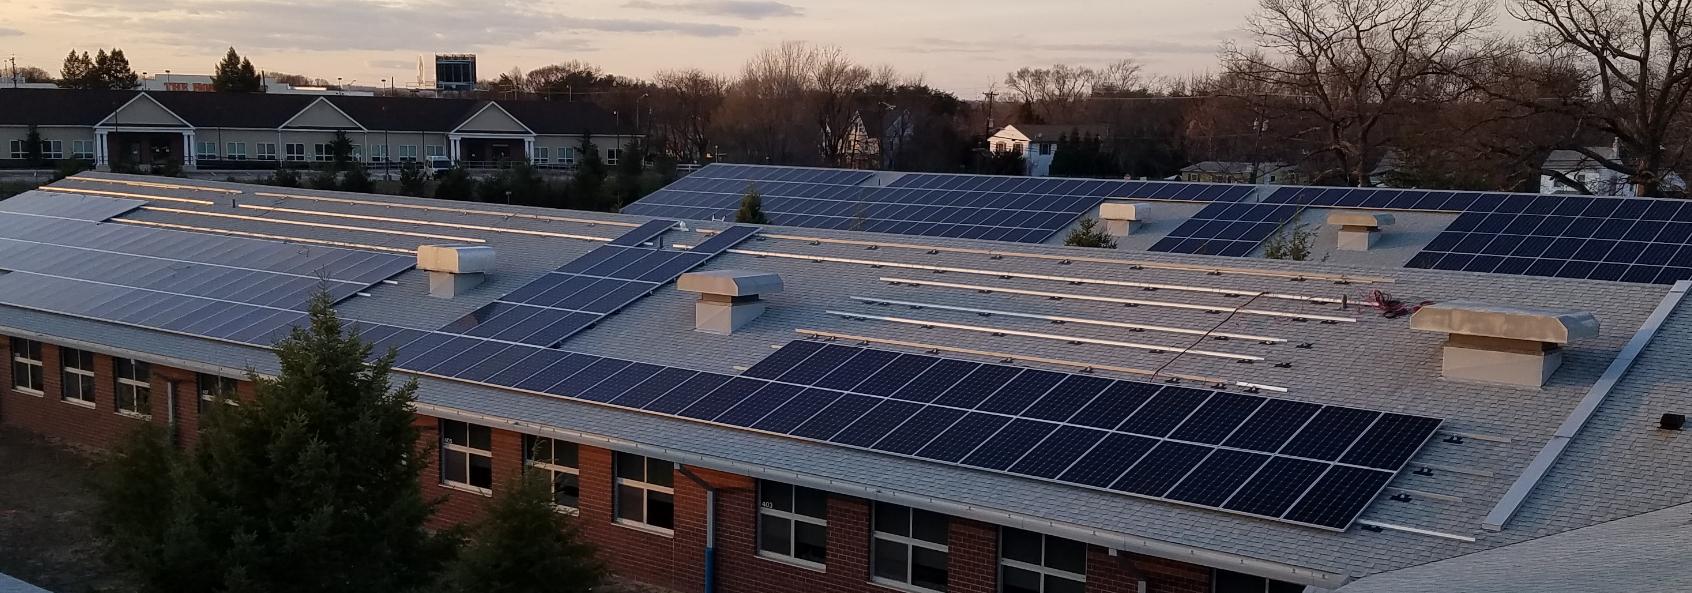 Delran Intermediate School Energysage